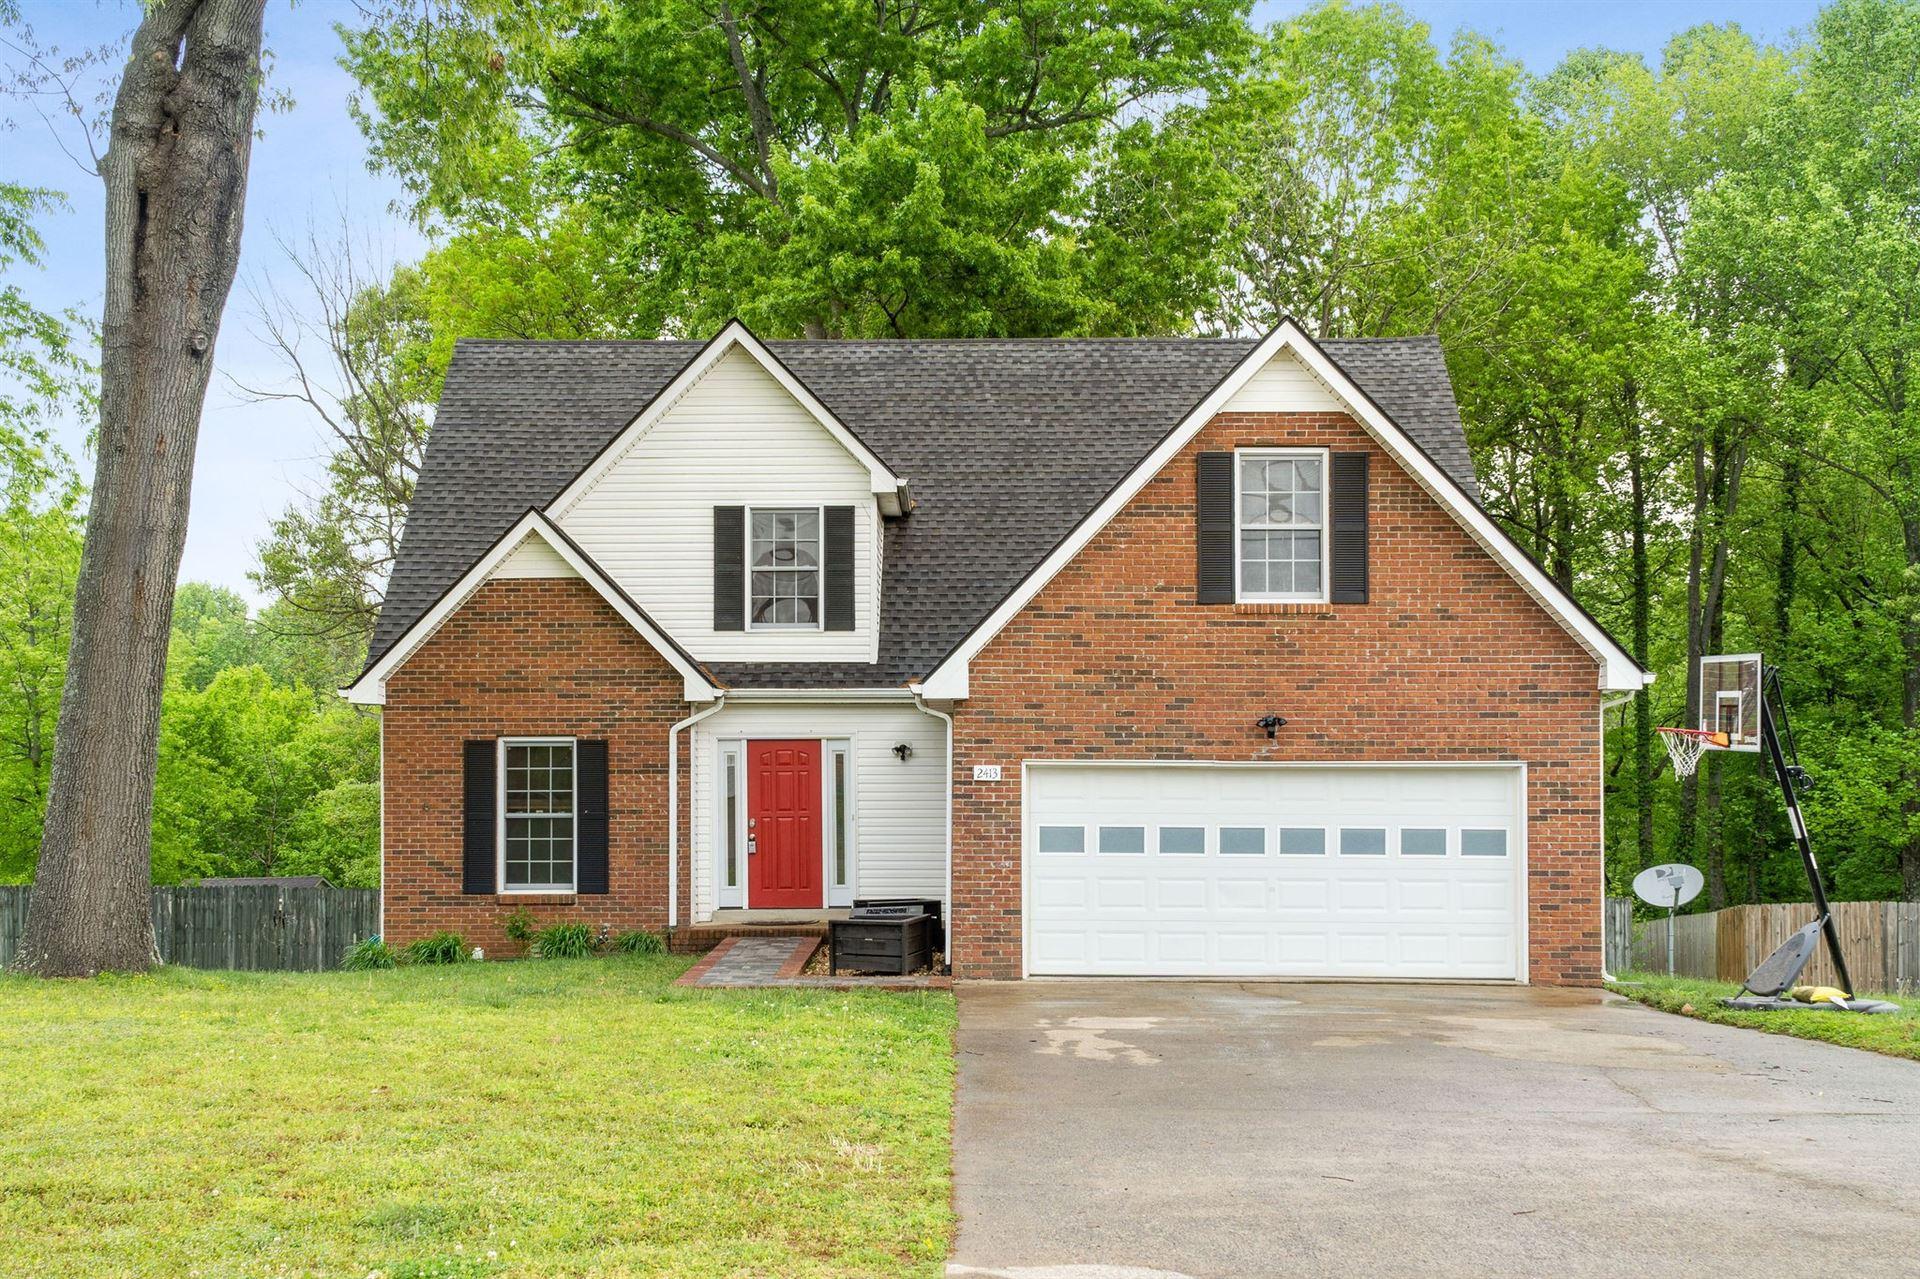 2413 Shoveler Way, Clarksville, TN 37042 - MLS#: 2249128